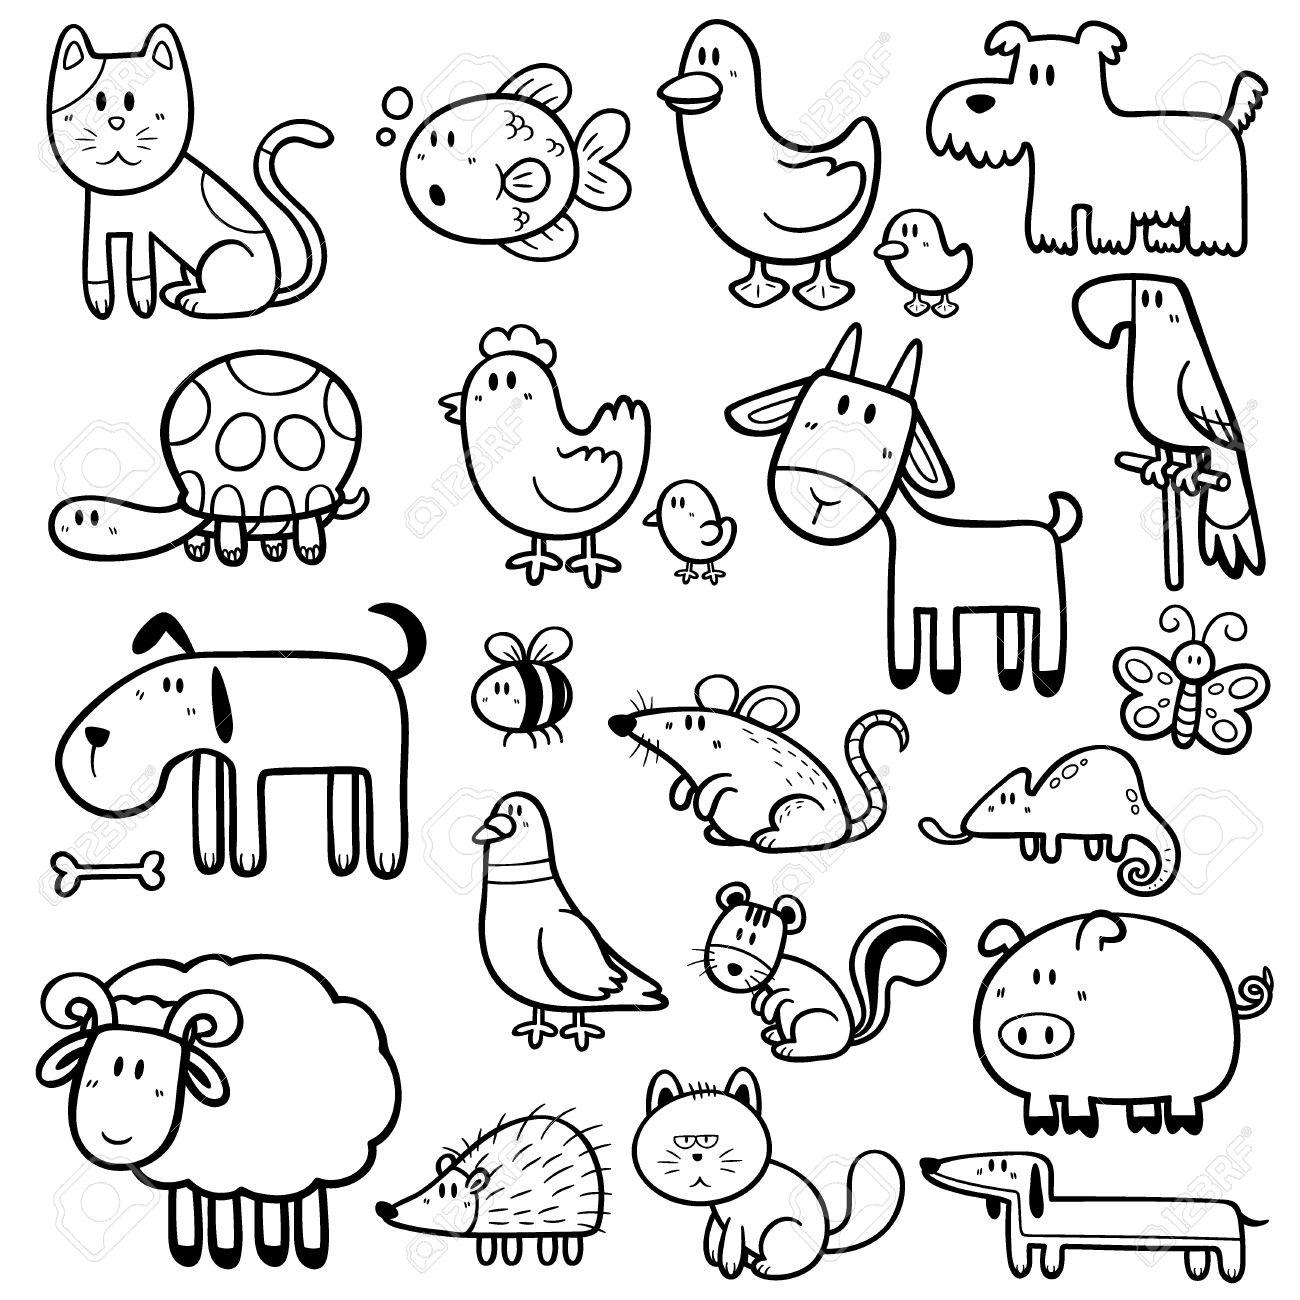 Vector Illustration Of Cartoon Animals - Coloring Book Royalty Free ...